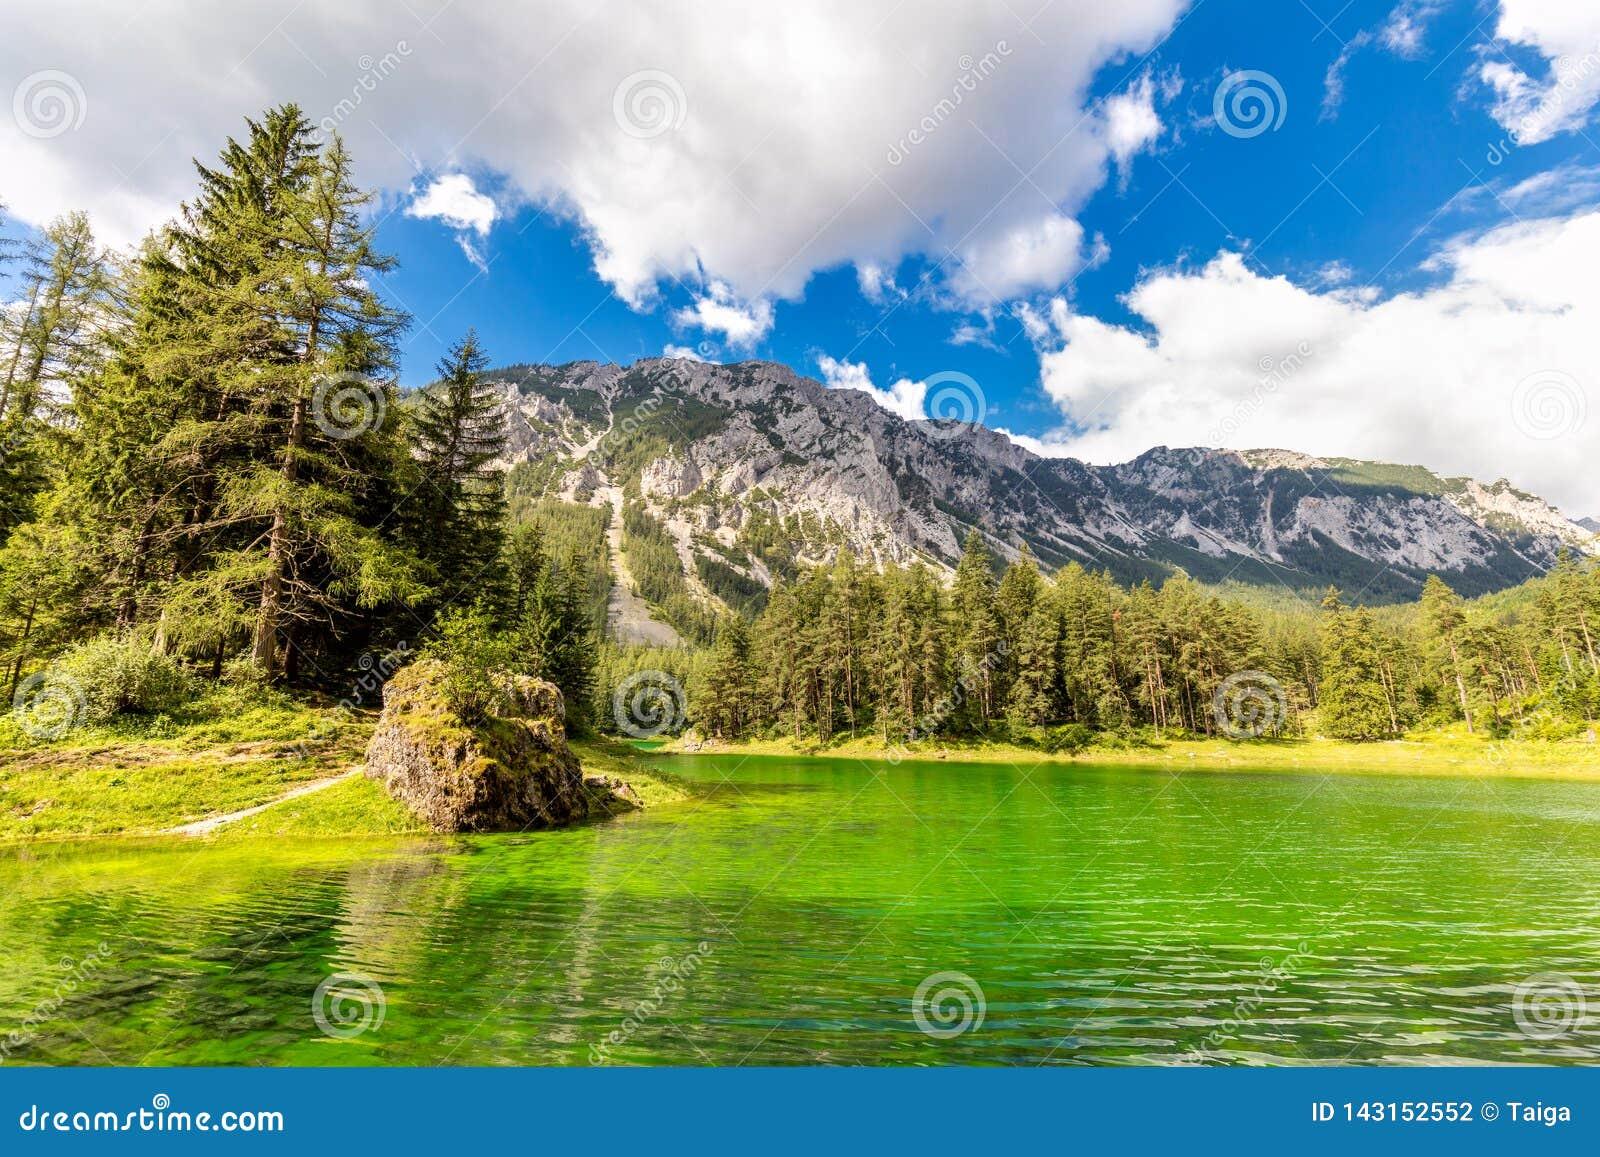 Cor verde real de surpresa do lago mountains, paisagem